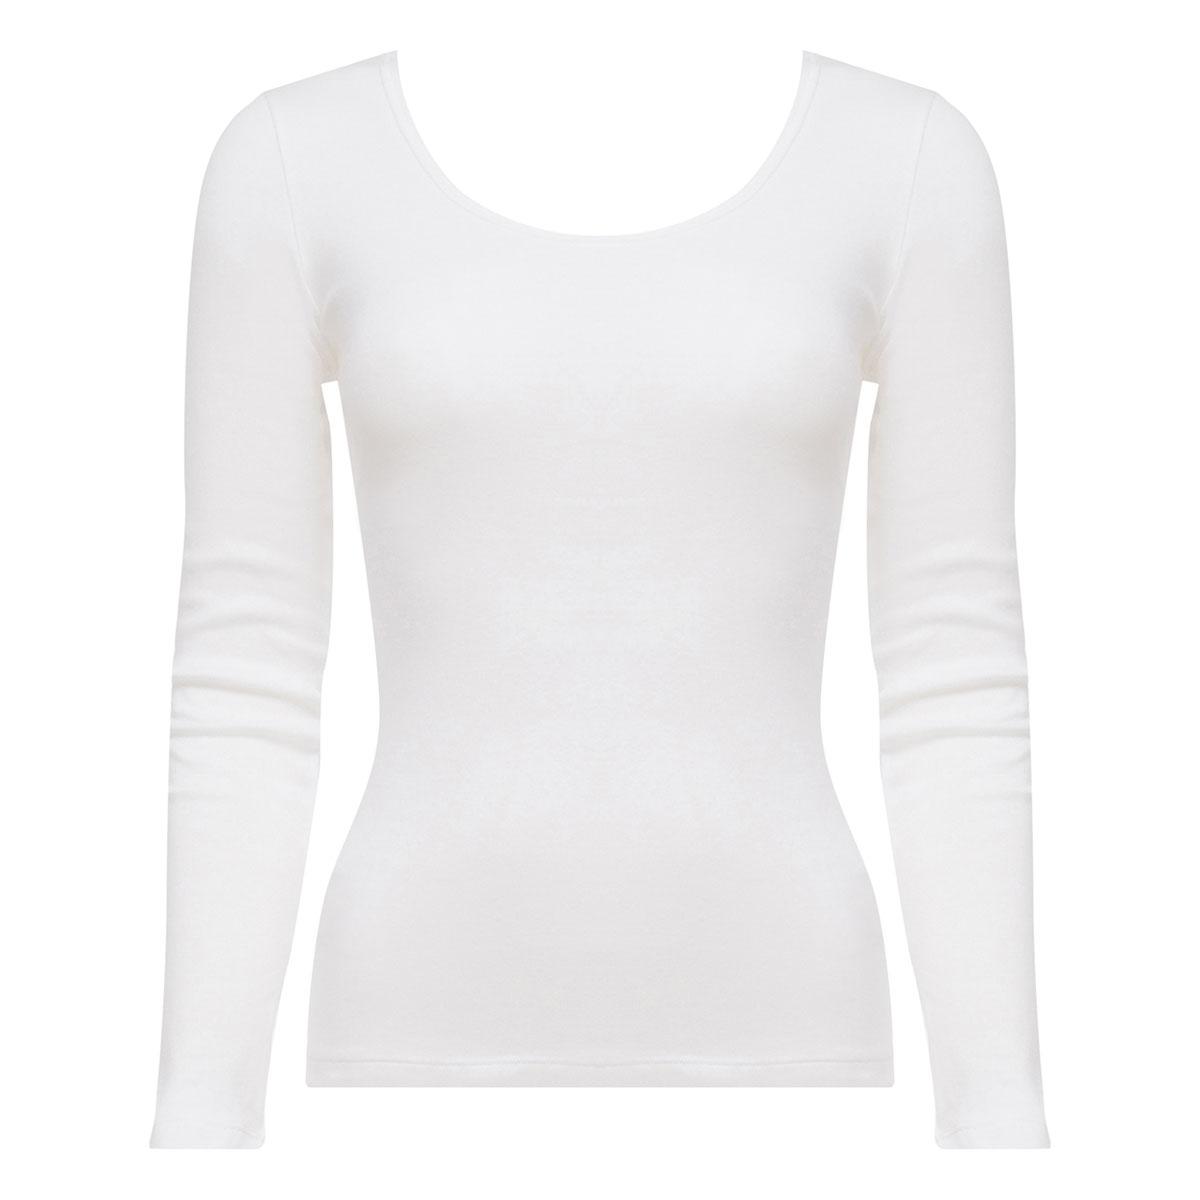 Top manches longues blanc - Cotton Liberty-PLAYTEX